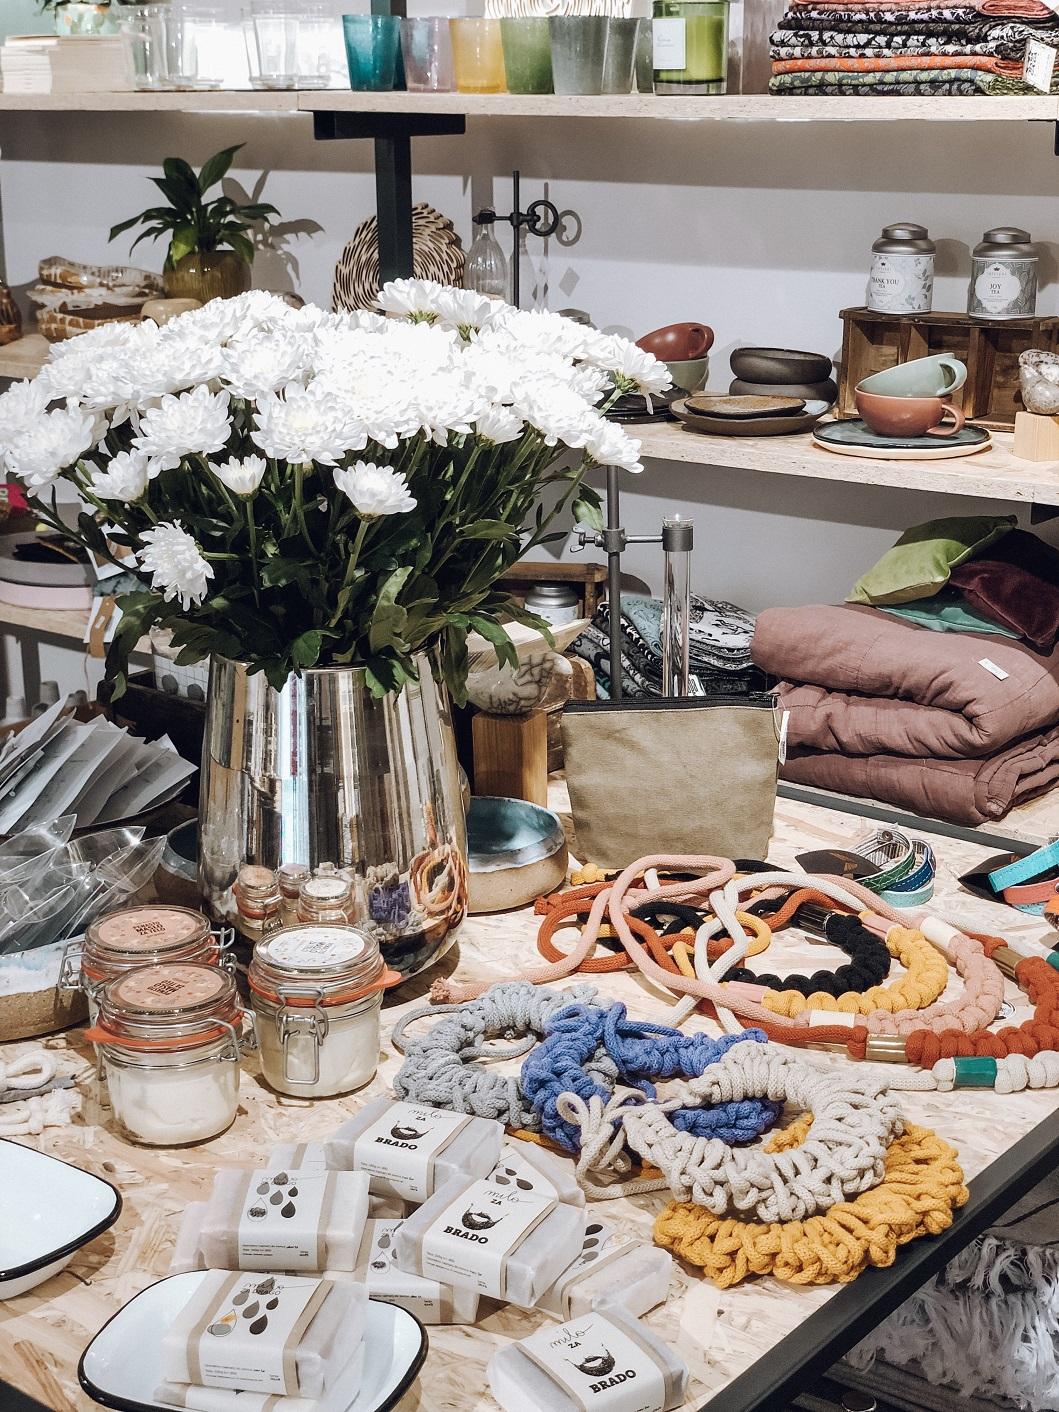 Trgovina Parada - 5 najlepših lifestyle trgovin